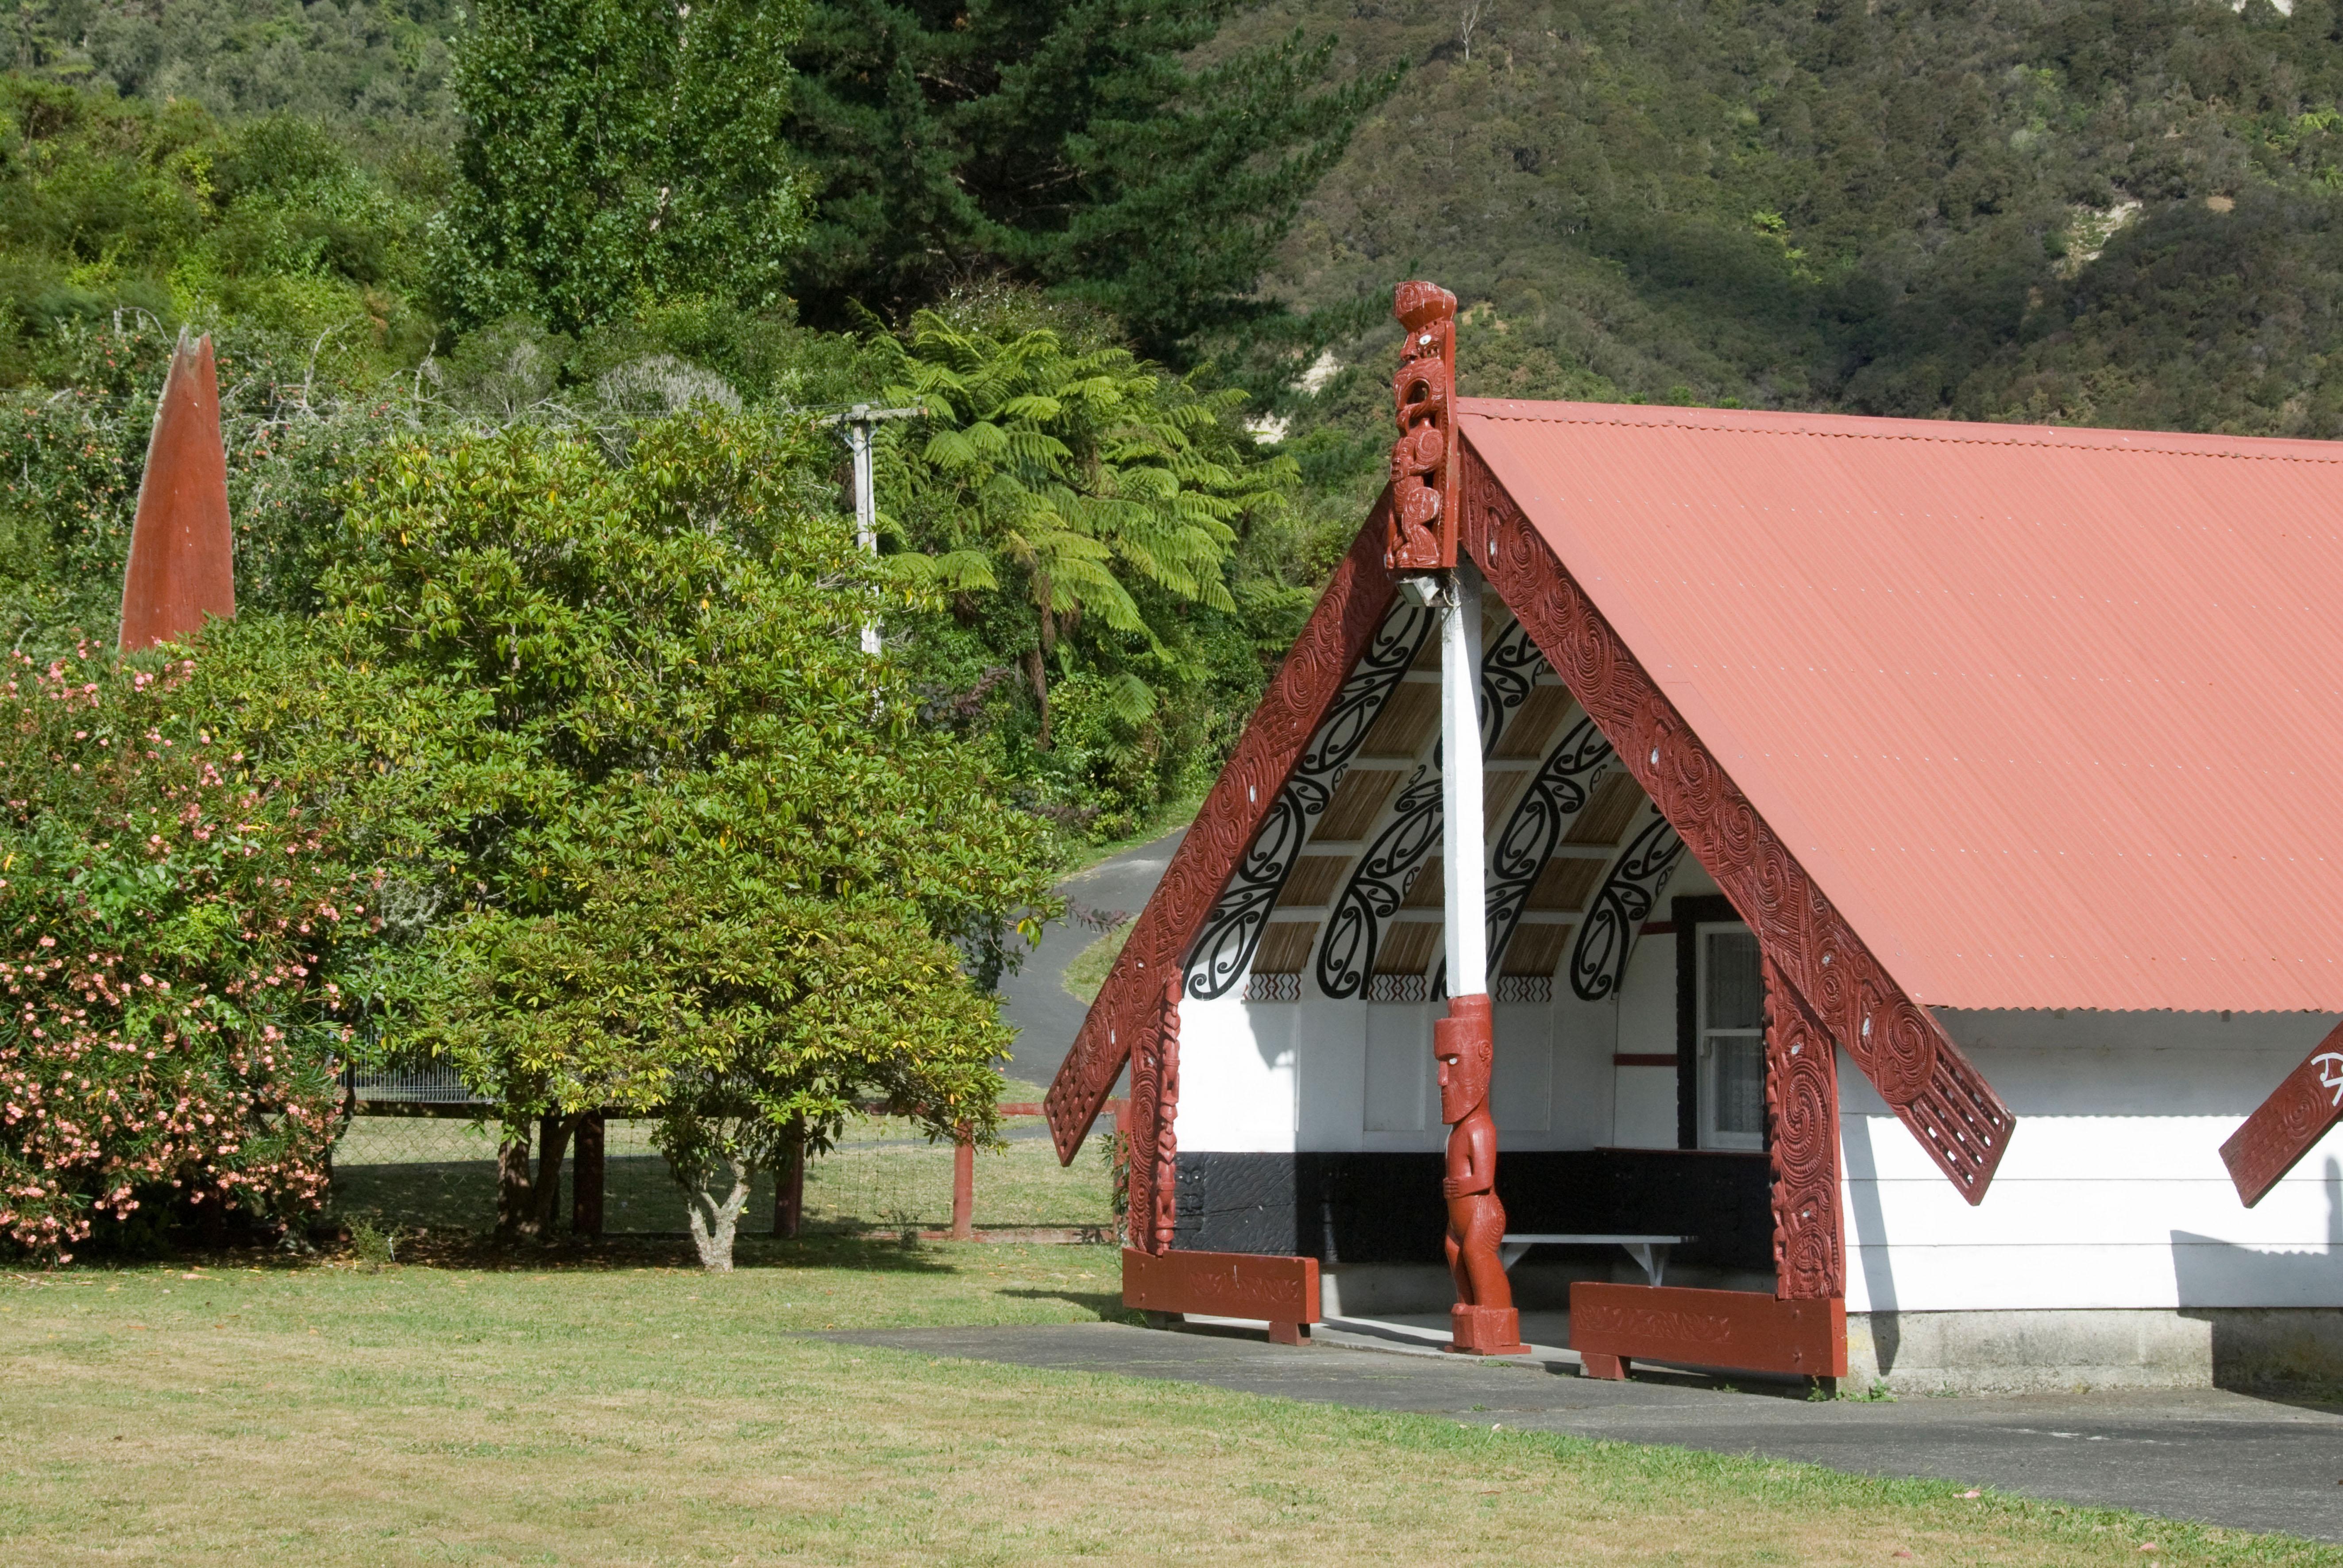 Maori meeting house, Koriniti Marae, Wanganui River, North Island, New Zealand. Image shot 02/2008. Exact date unknown.